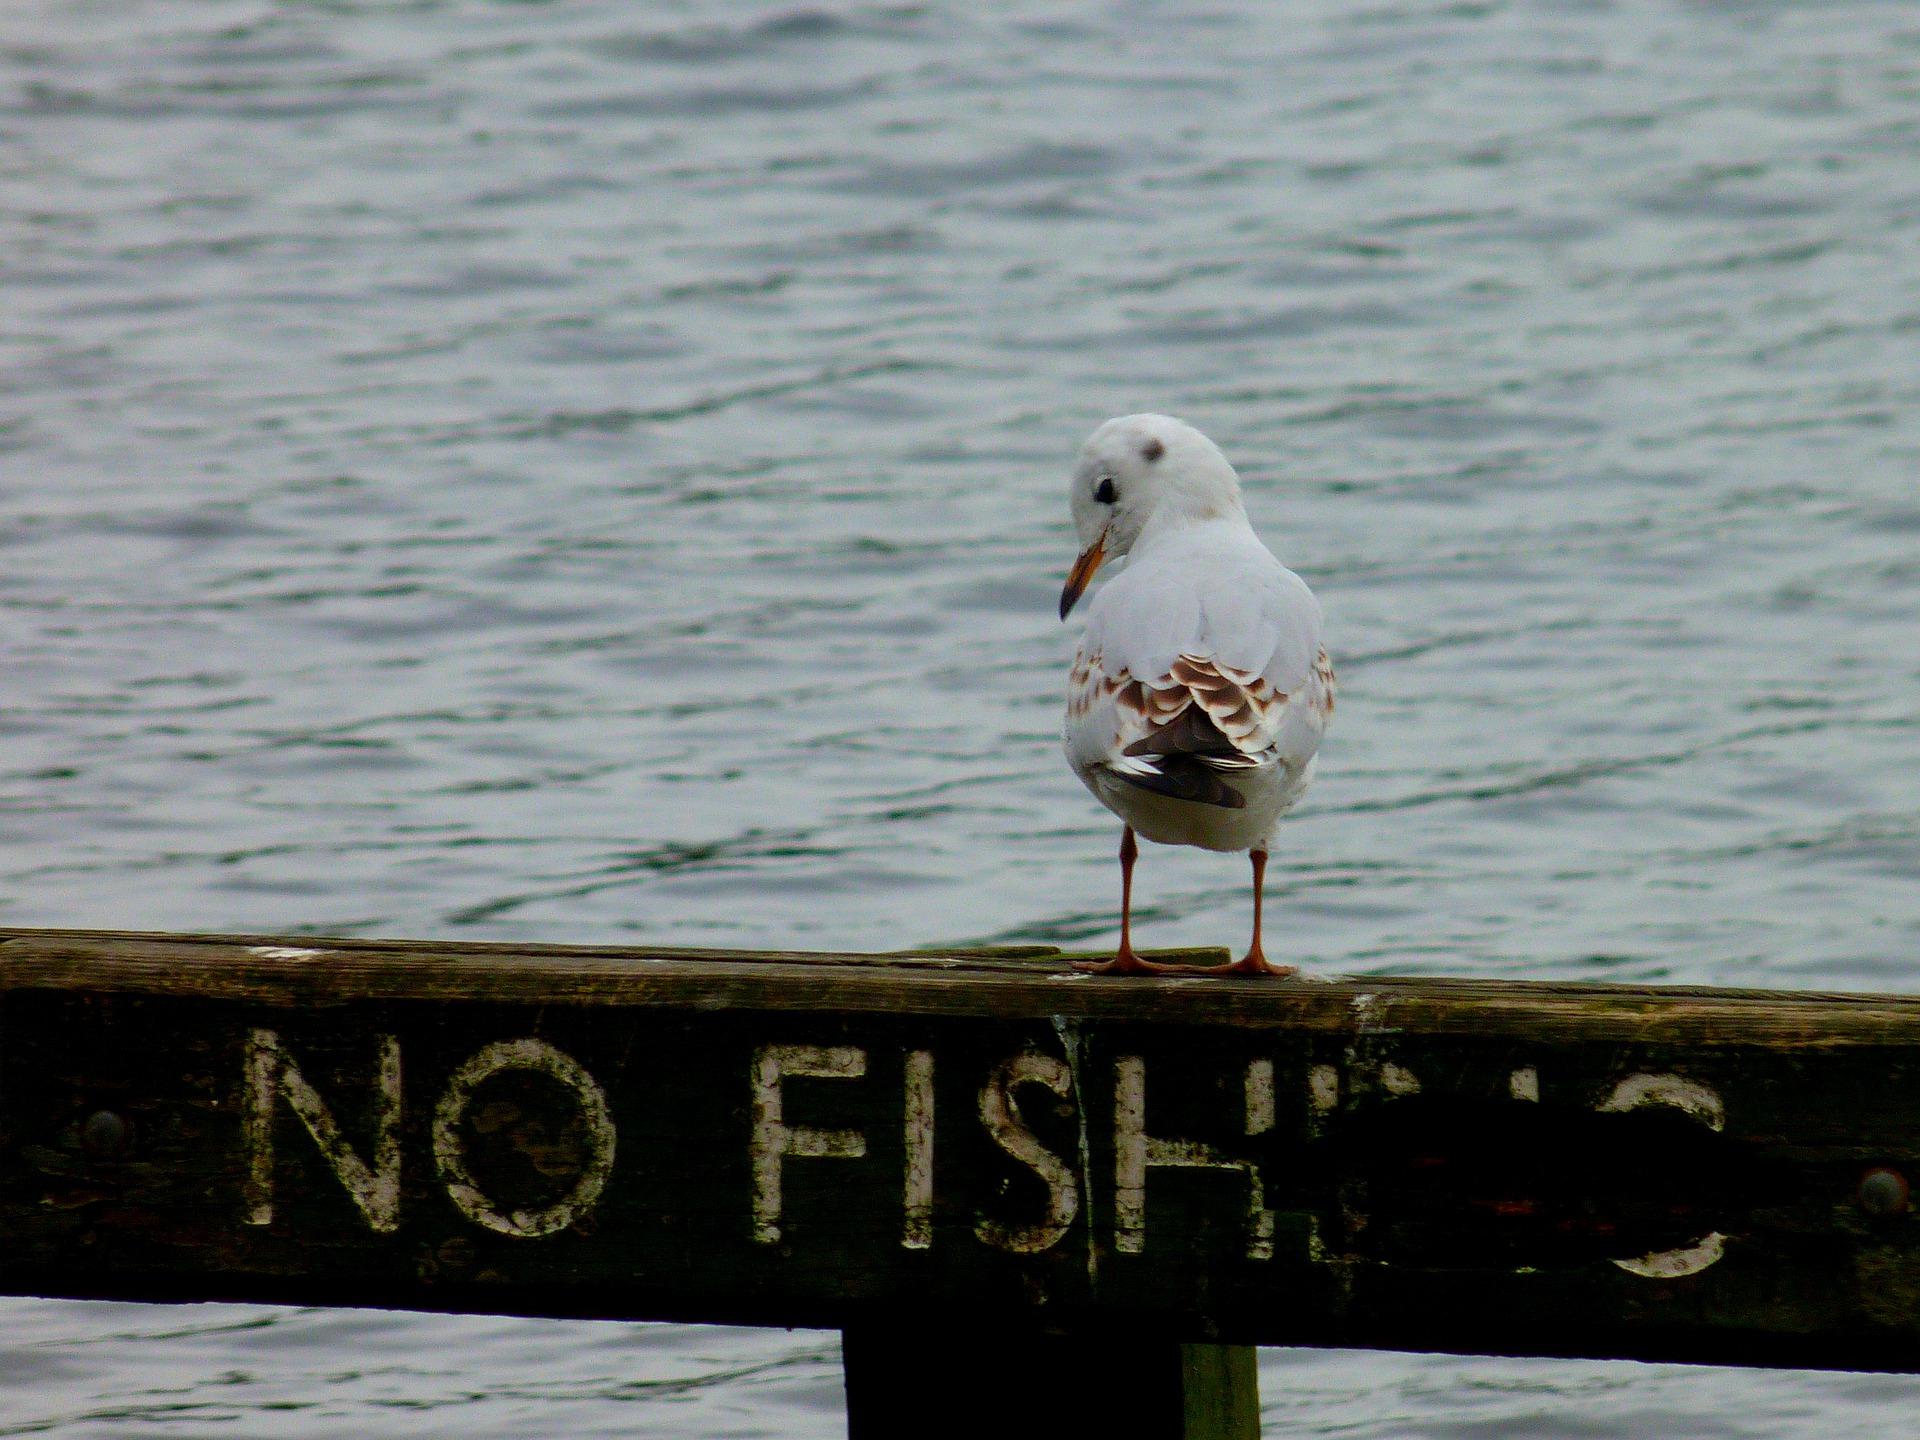 no-fishing-4848114_1920.jpg